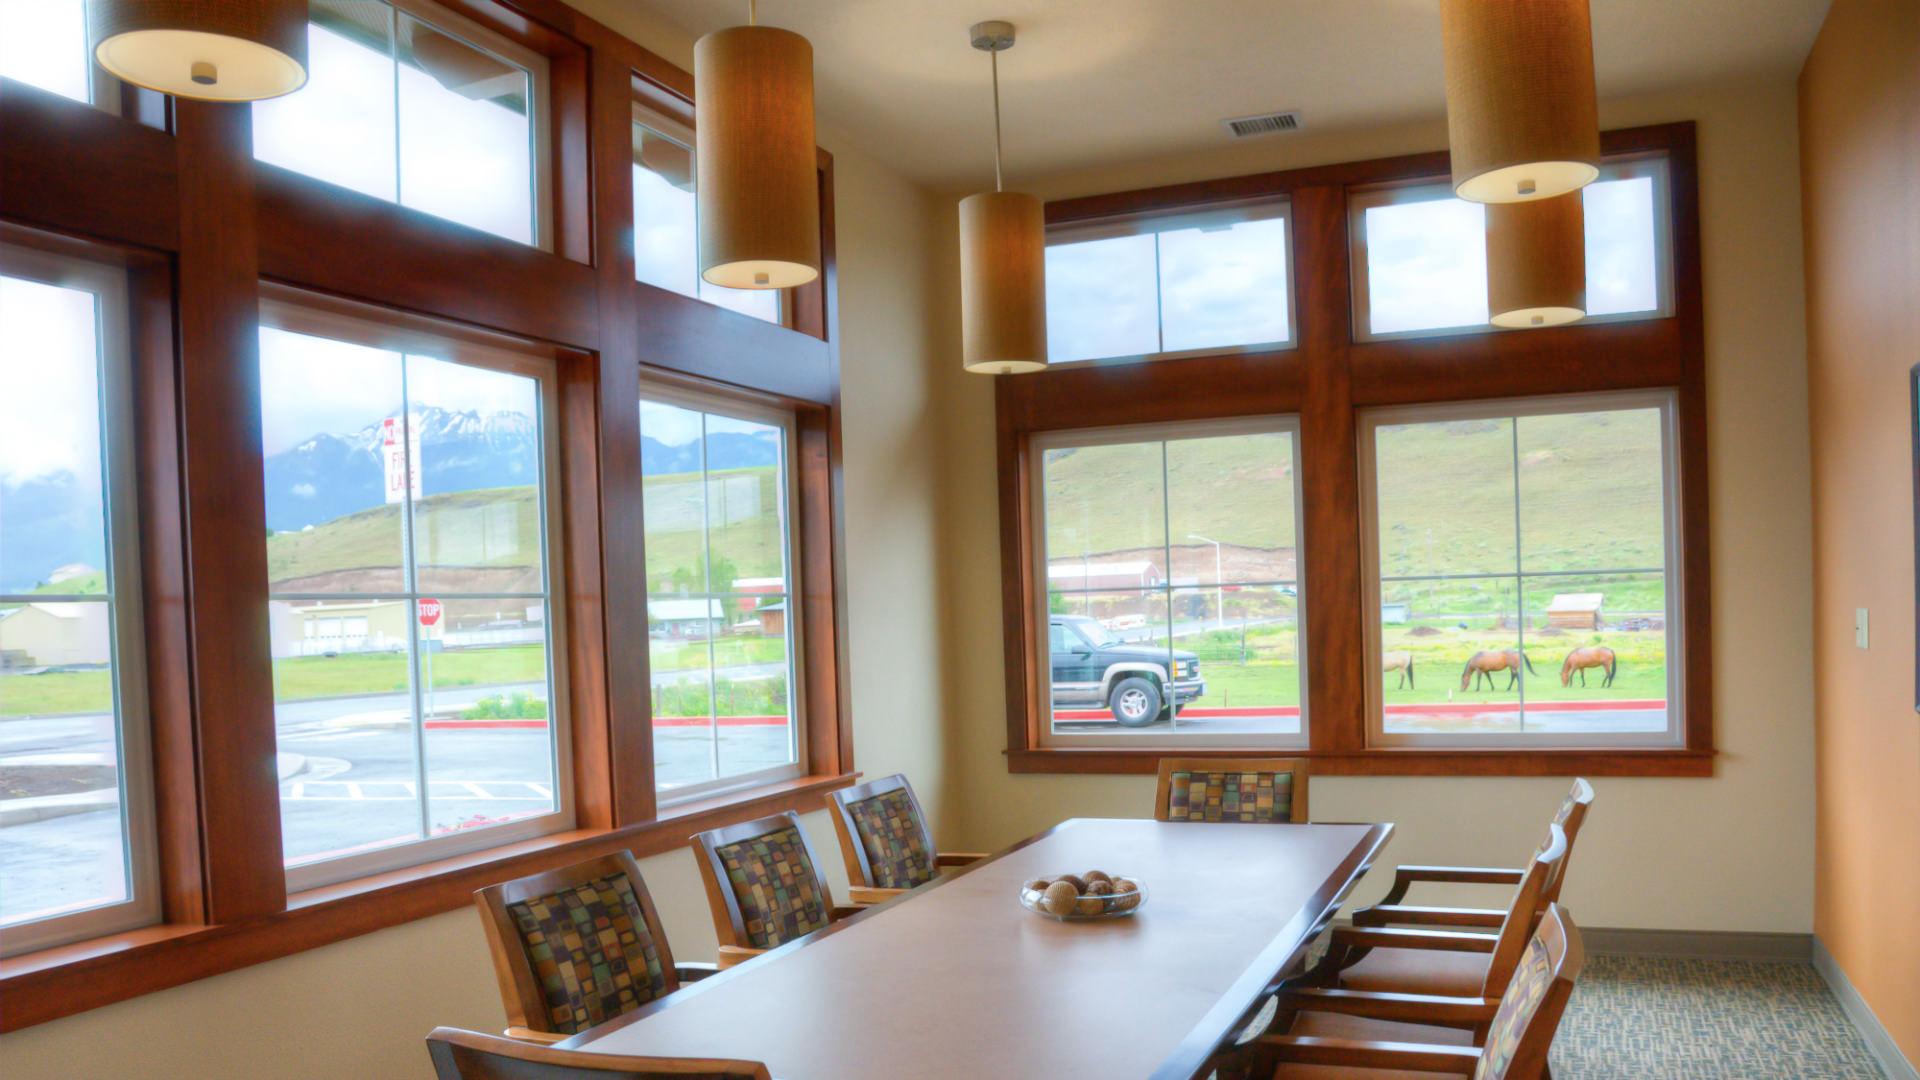 Modular complex building interior 2020 | Modern Building Systems, Inc.®